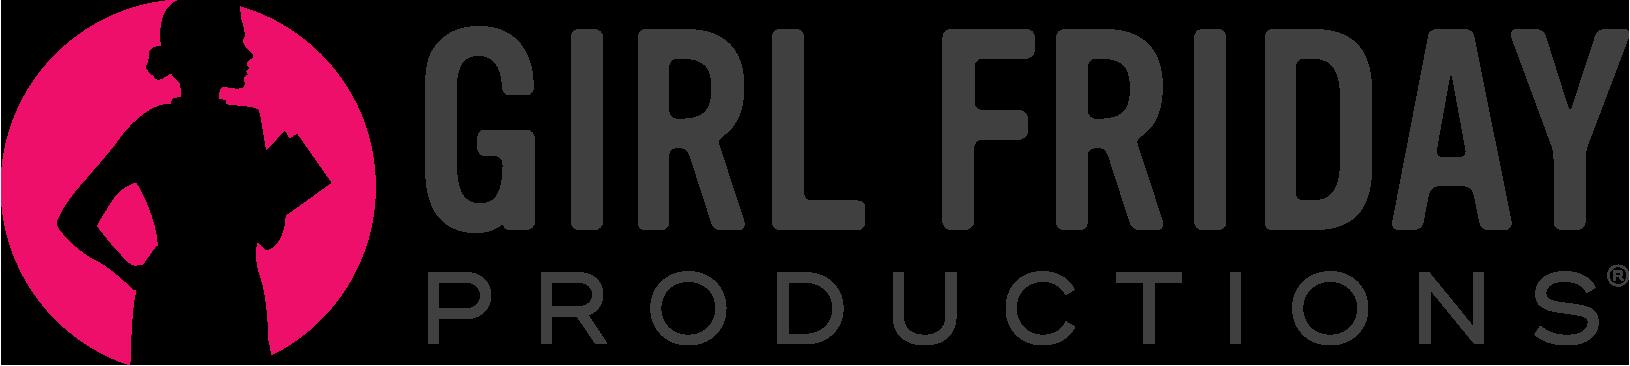 gfp-logo-pink-gray.png